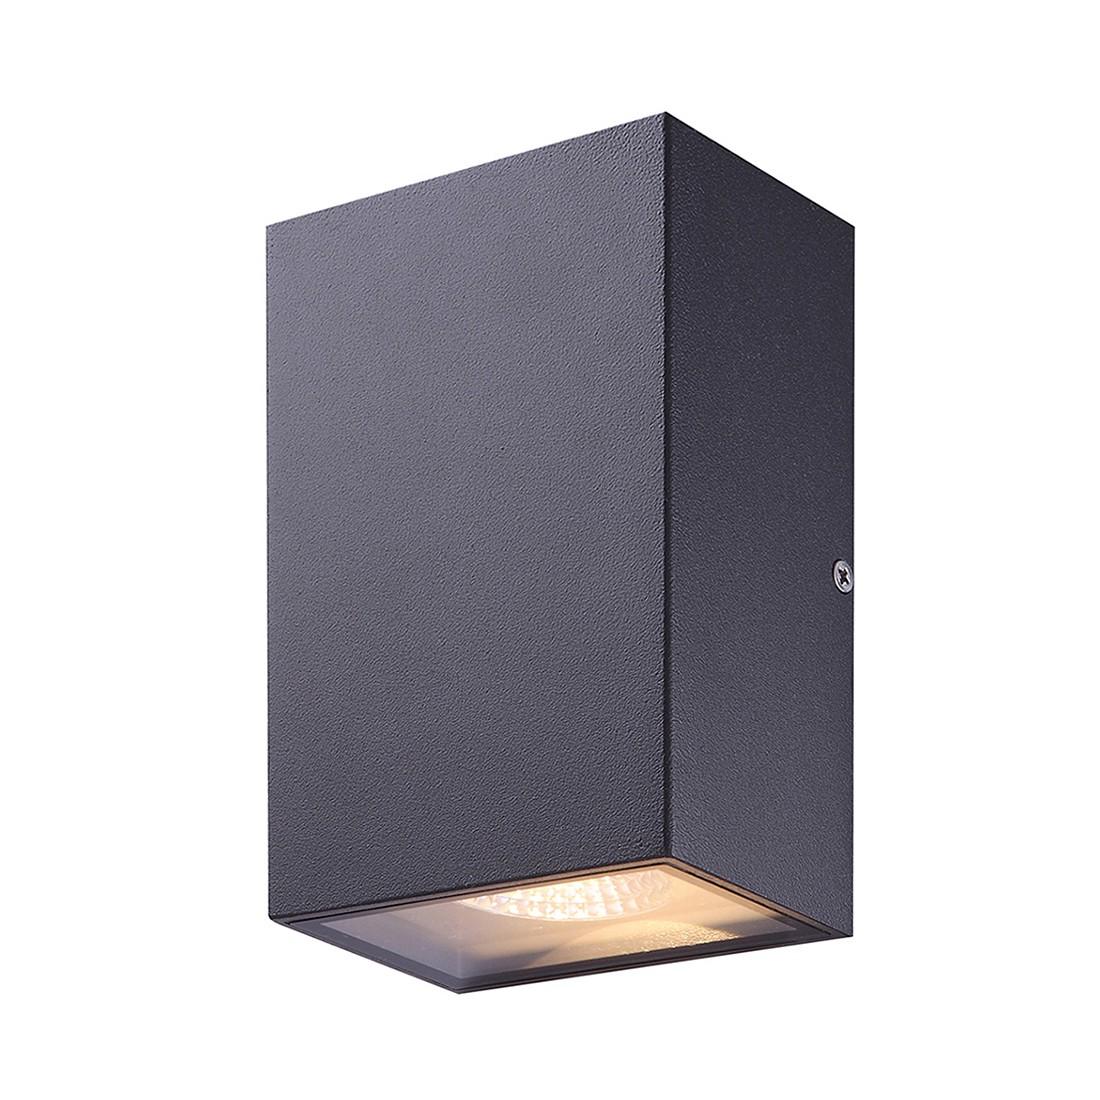 EEK A+, LED-Außenleuchte Yuan by Globo - Aluminium/Glas - Grau, Globo Lighting